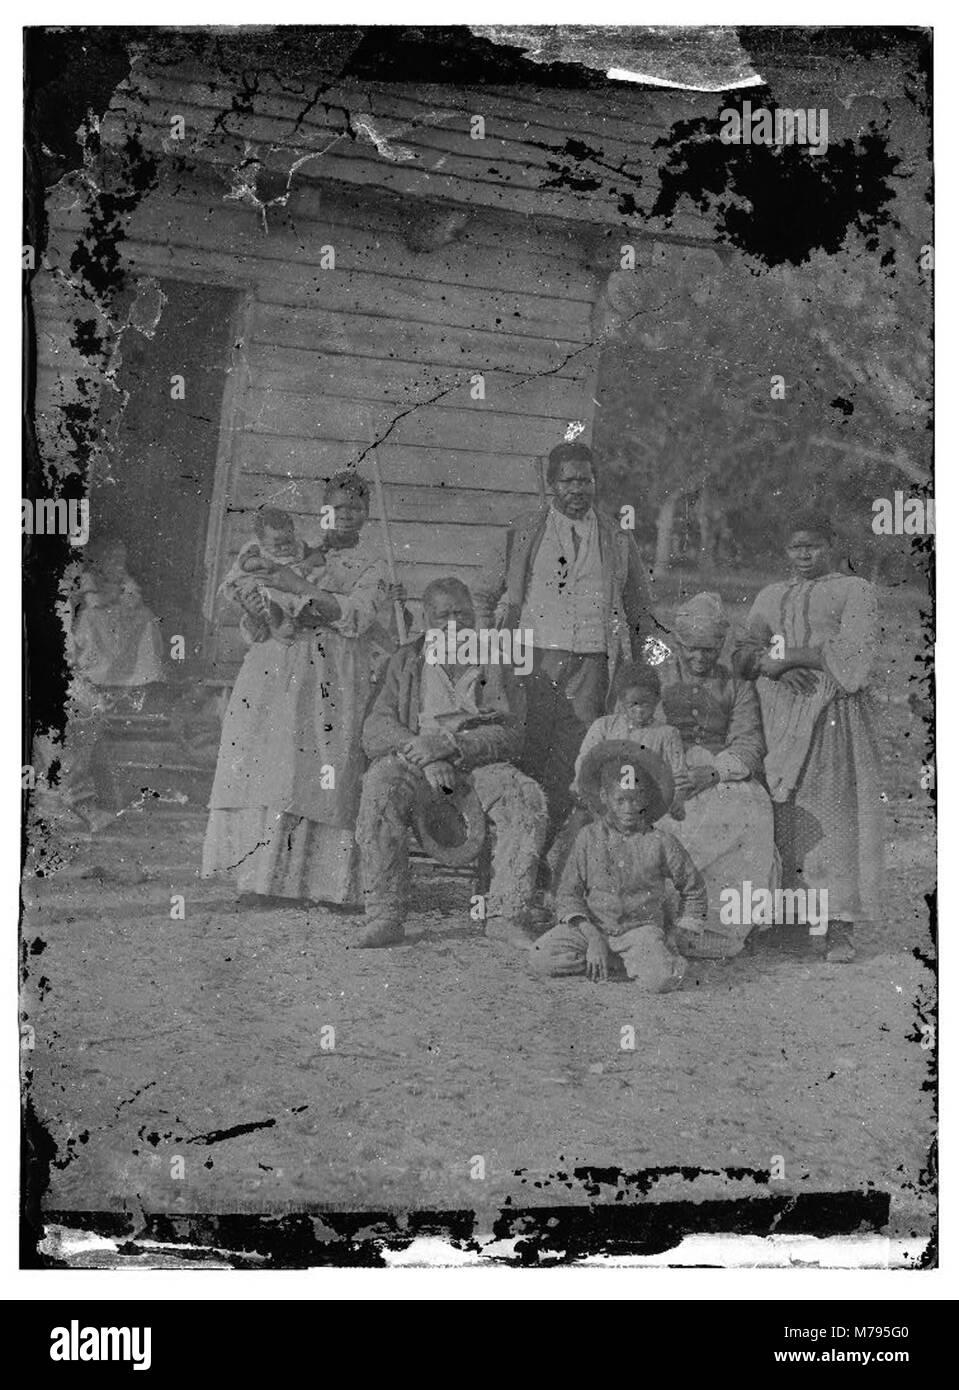 Beaufort, South Carolina. Negro family representing several generations. All born on the plantation of J.J. Smith - Stock Image